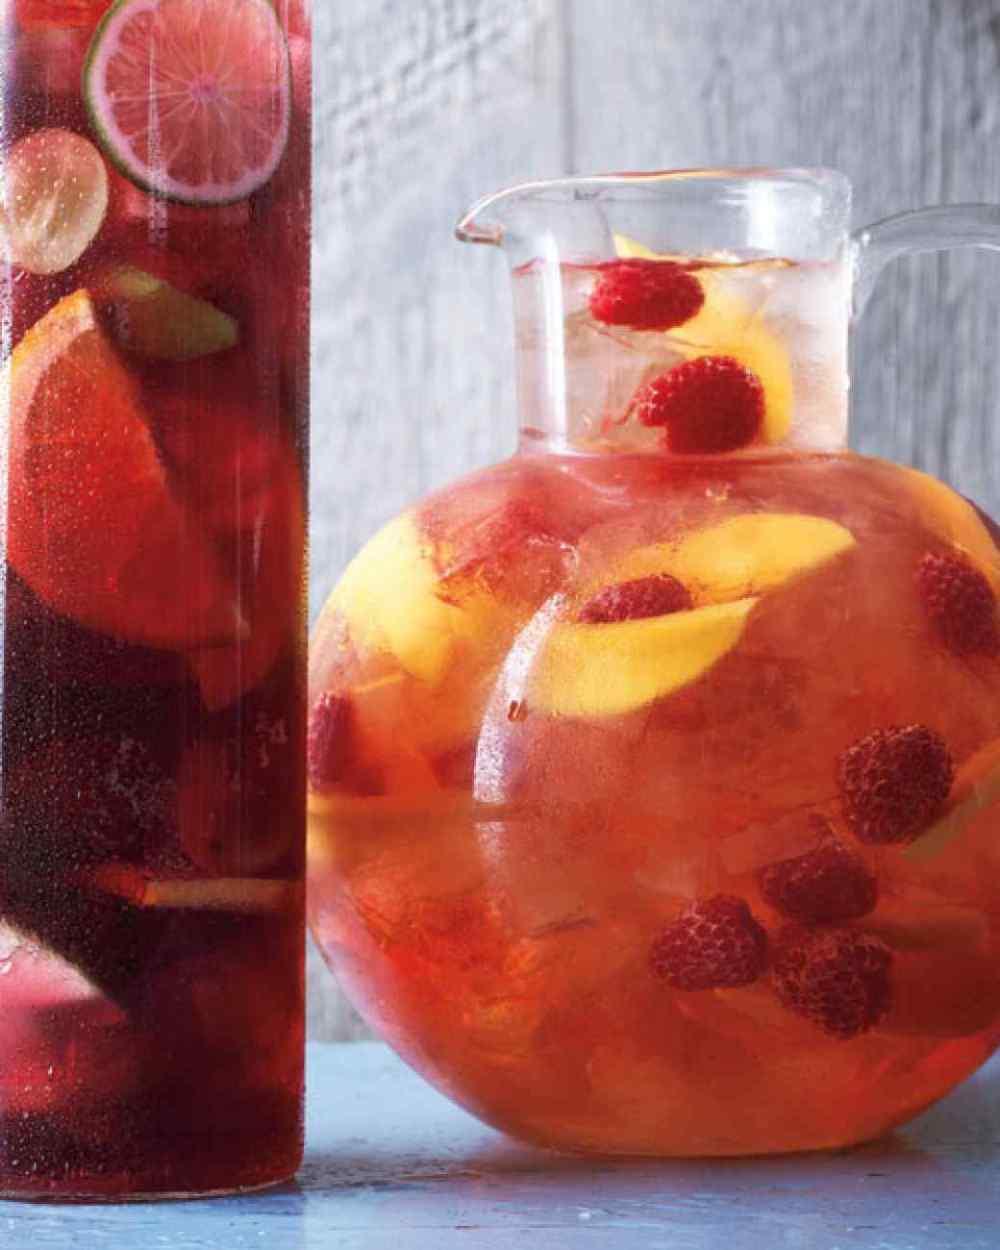 rasberry mango sangria.jpg